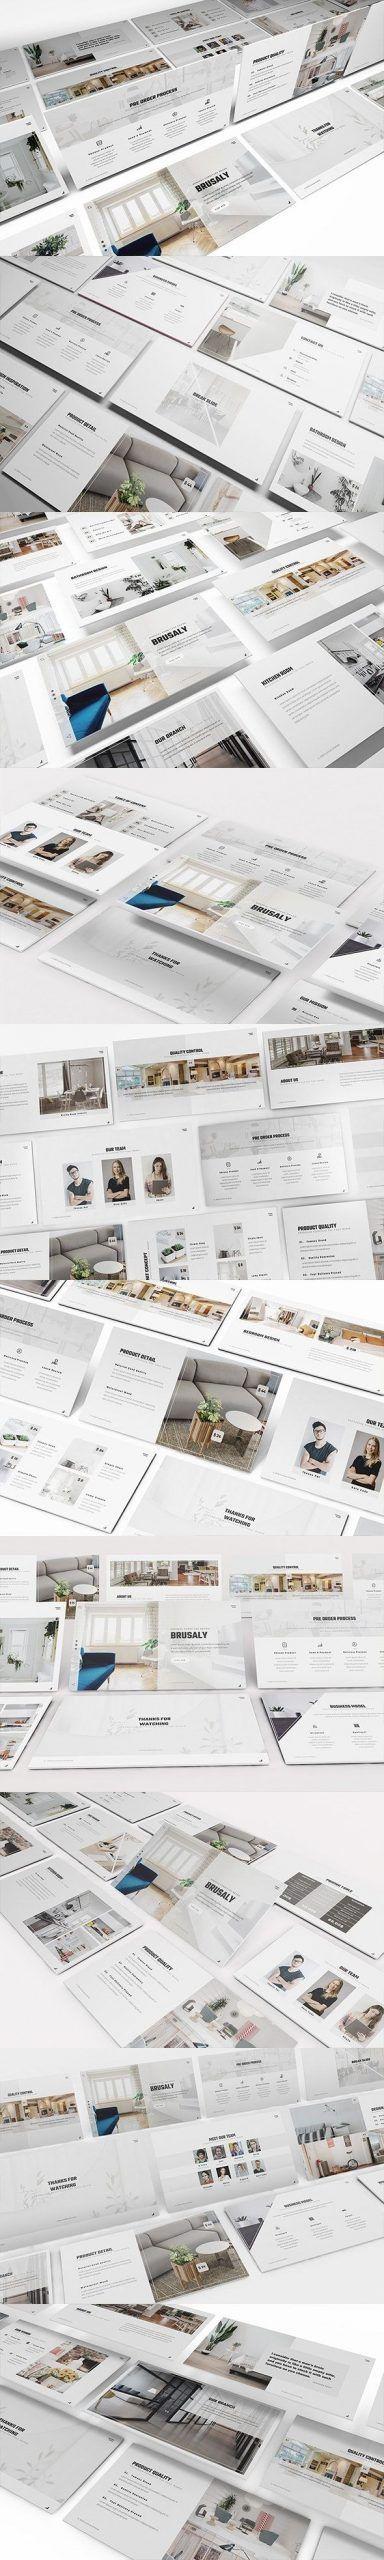 Furniture Keynote Presentation Templatefurniture